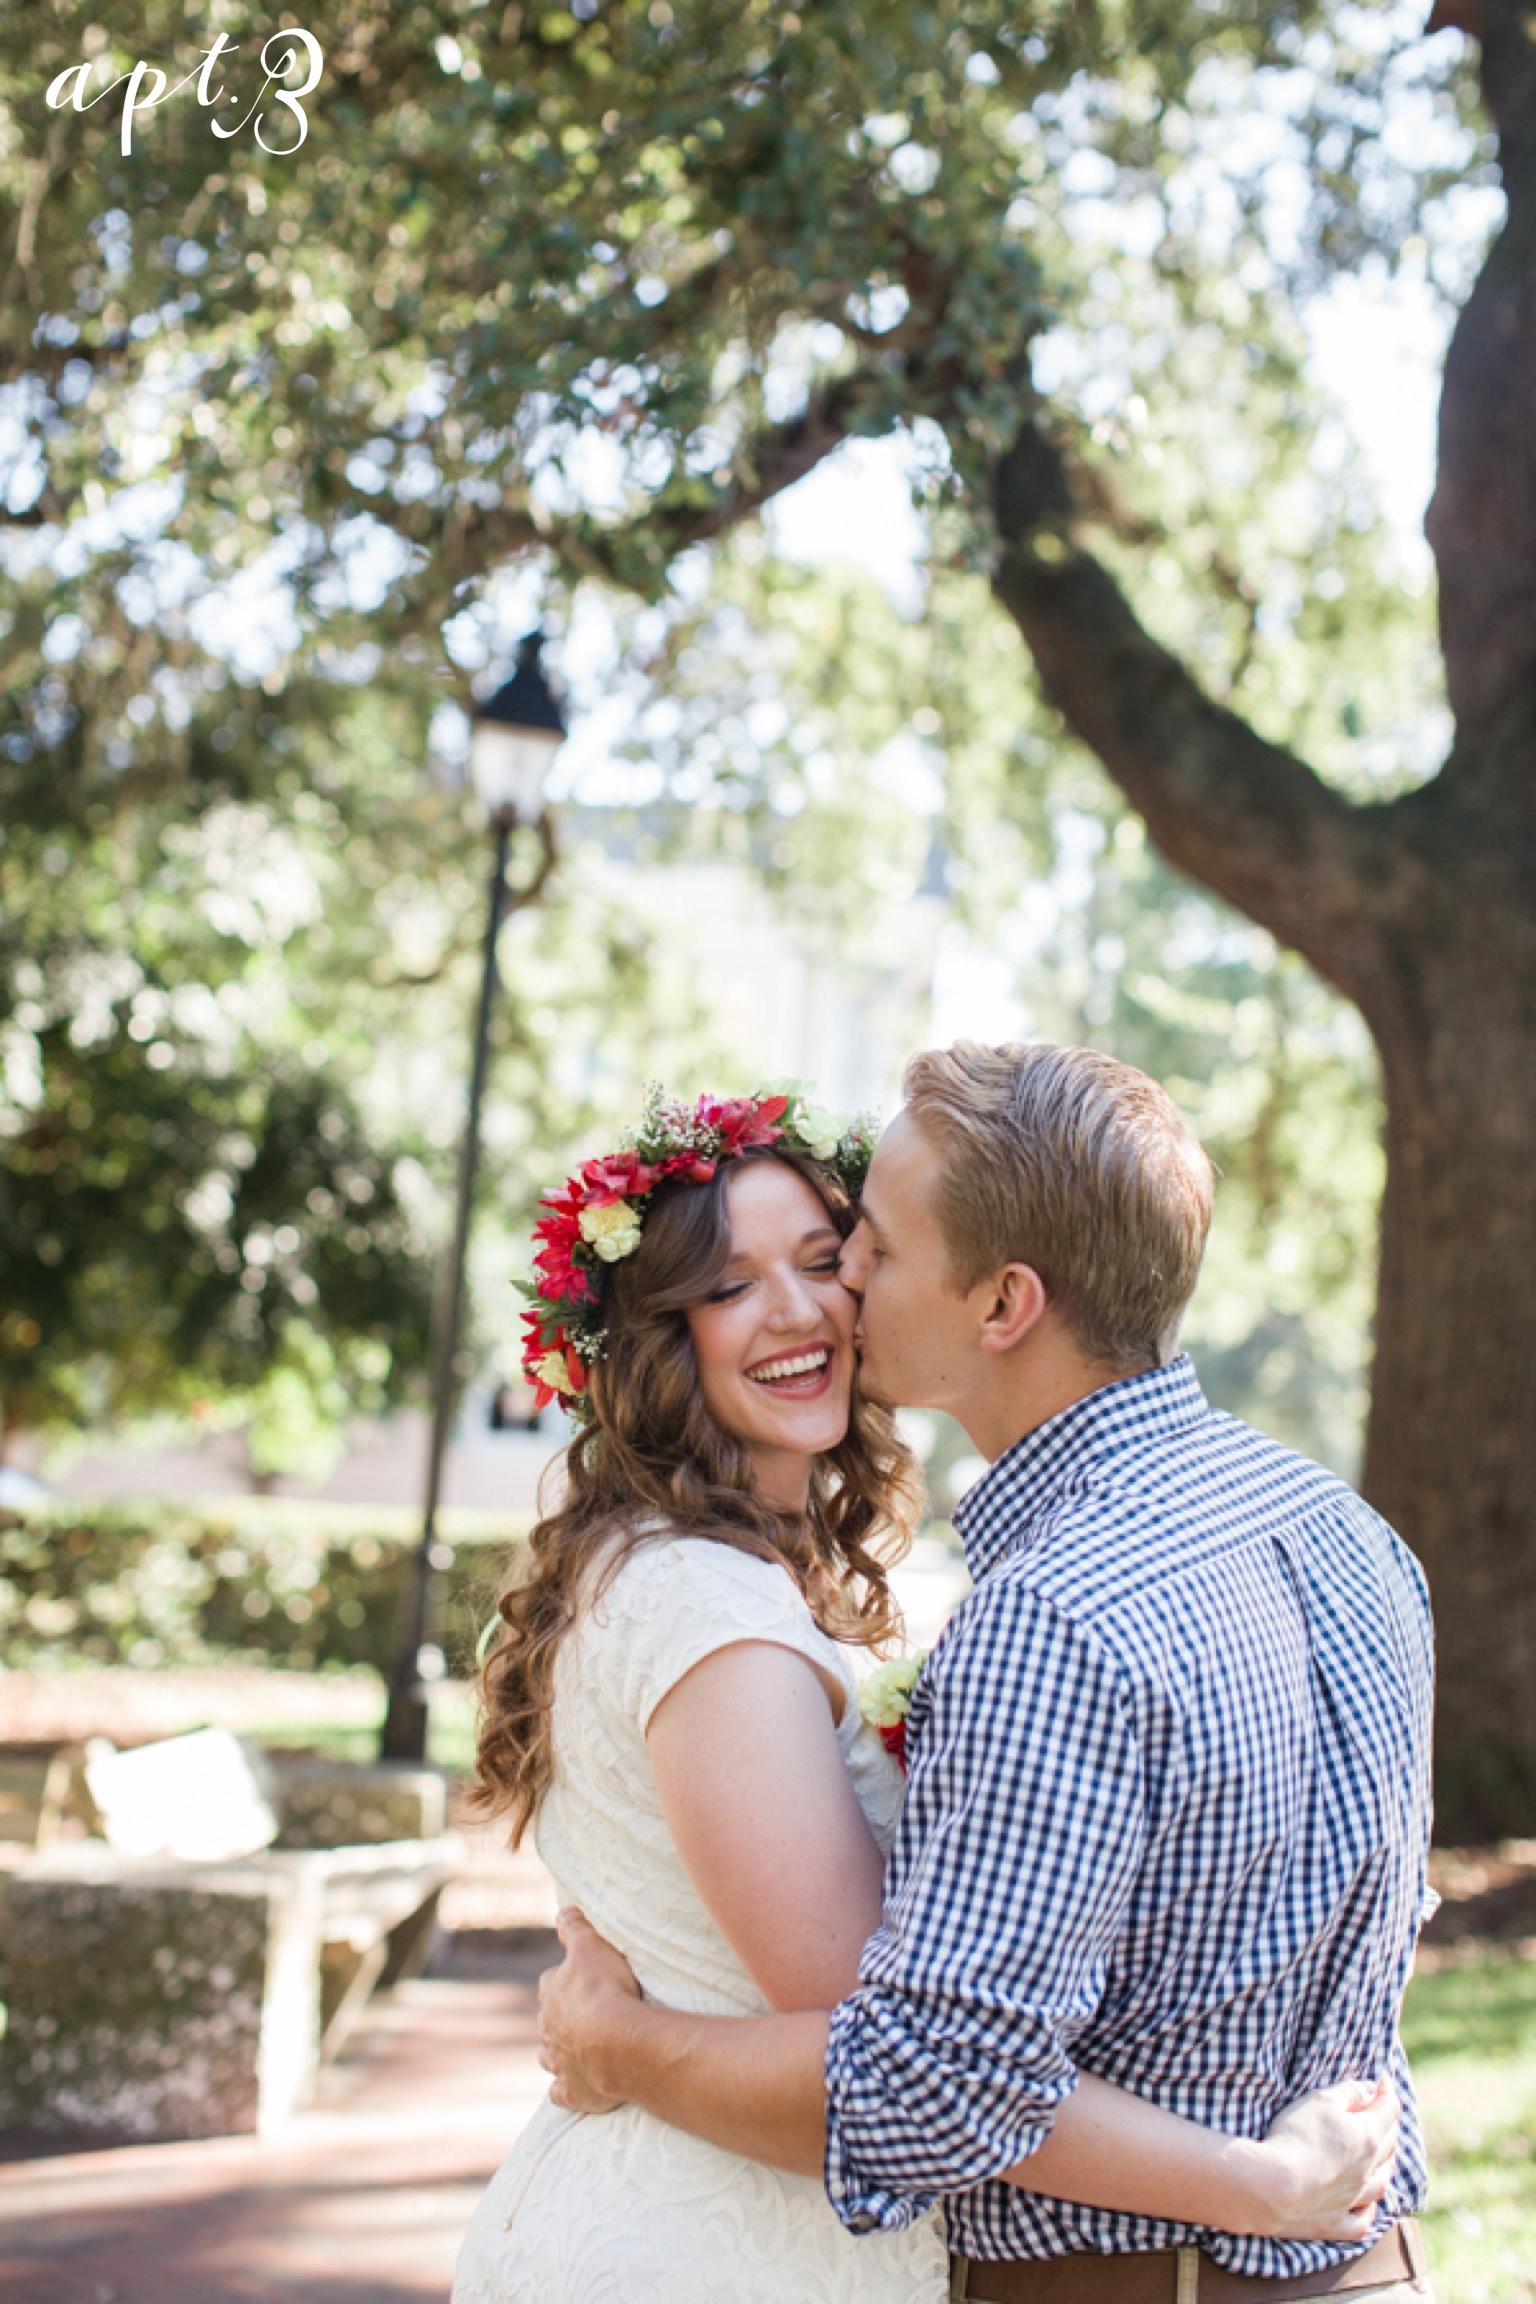 AptBPhotography_SavannahGA_Engagement-22.jpg